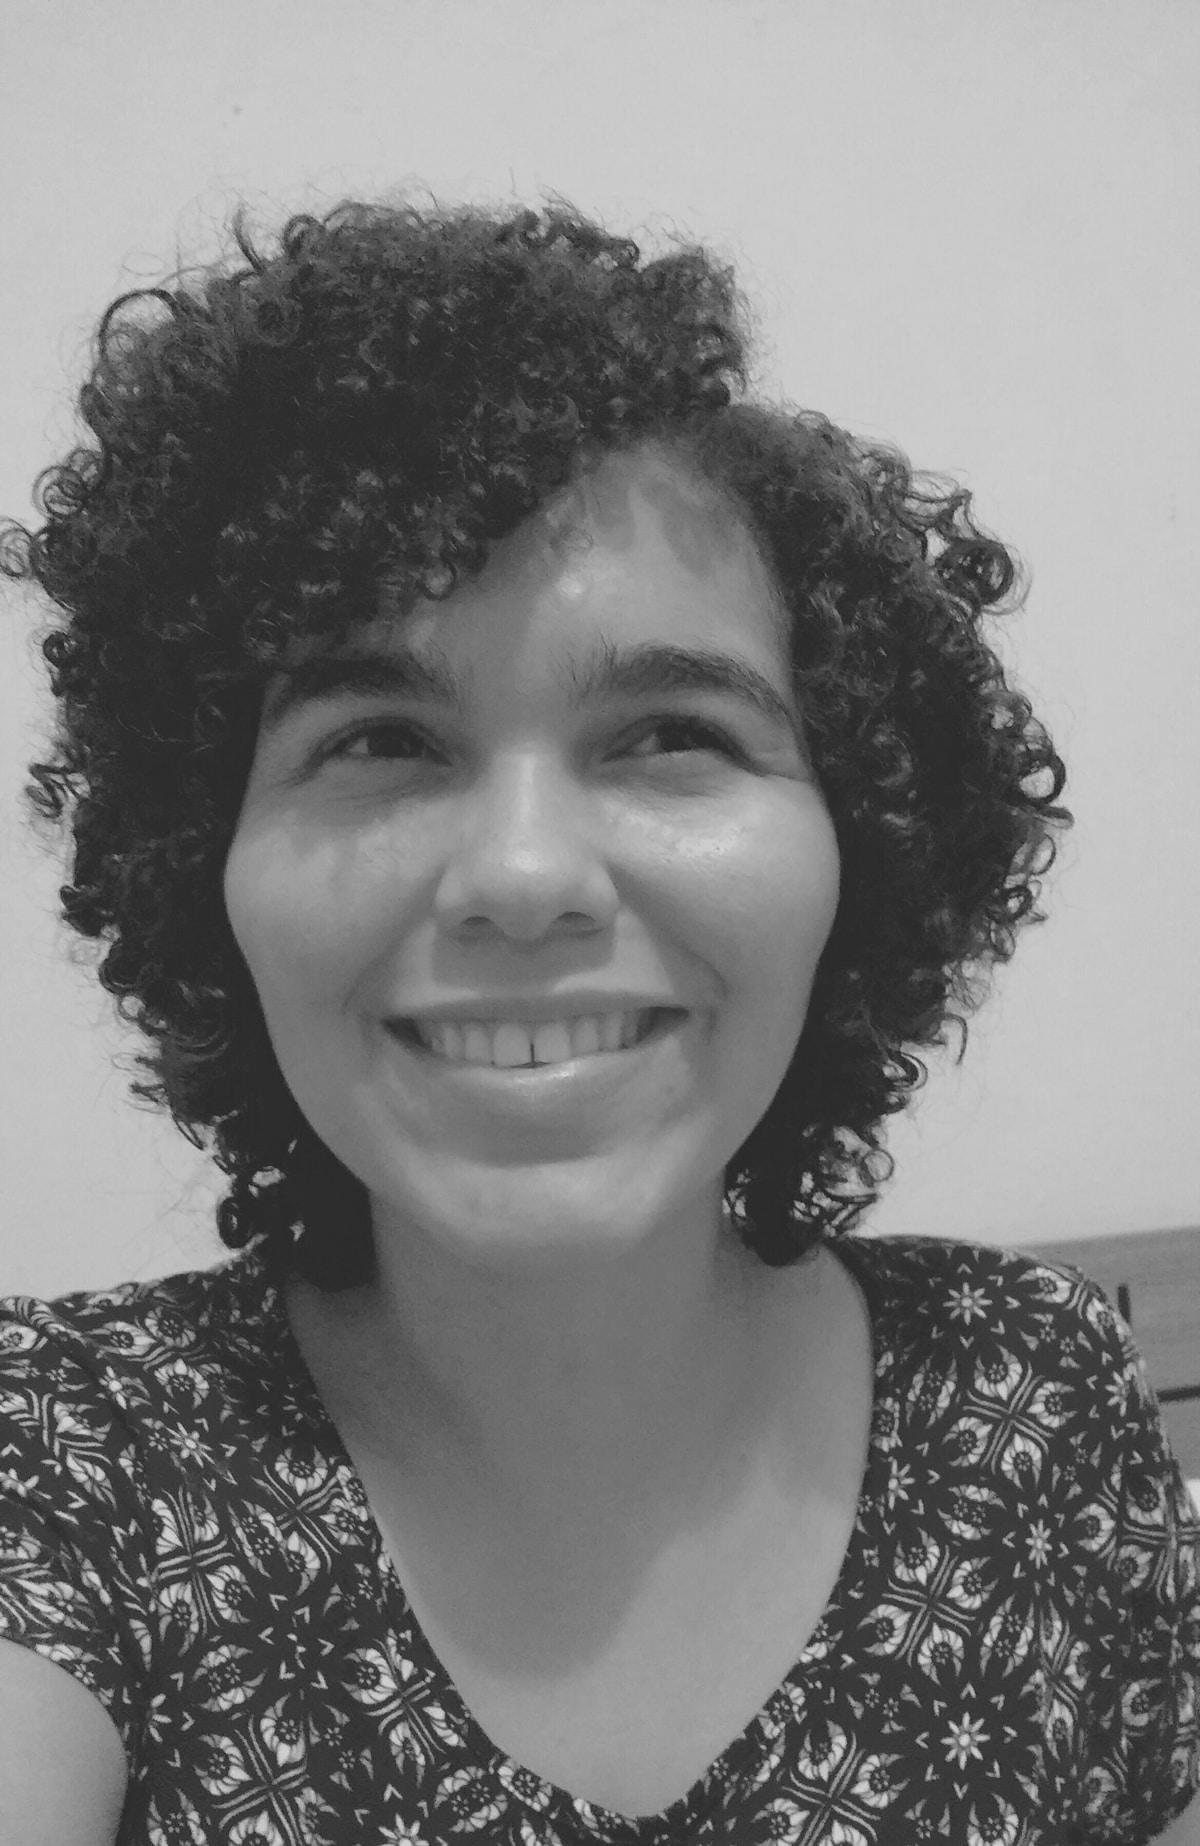 Go to Ana Terdolino's profile